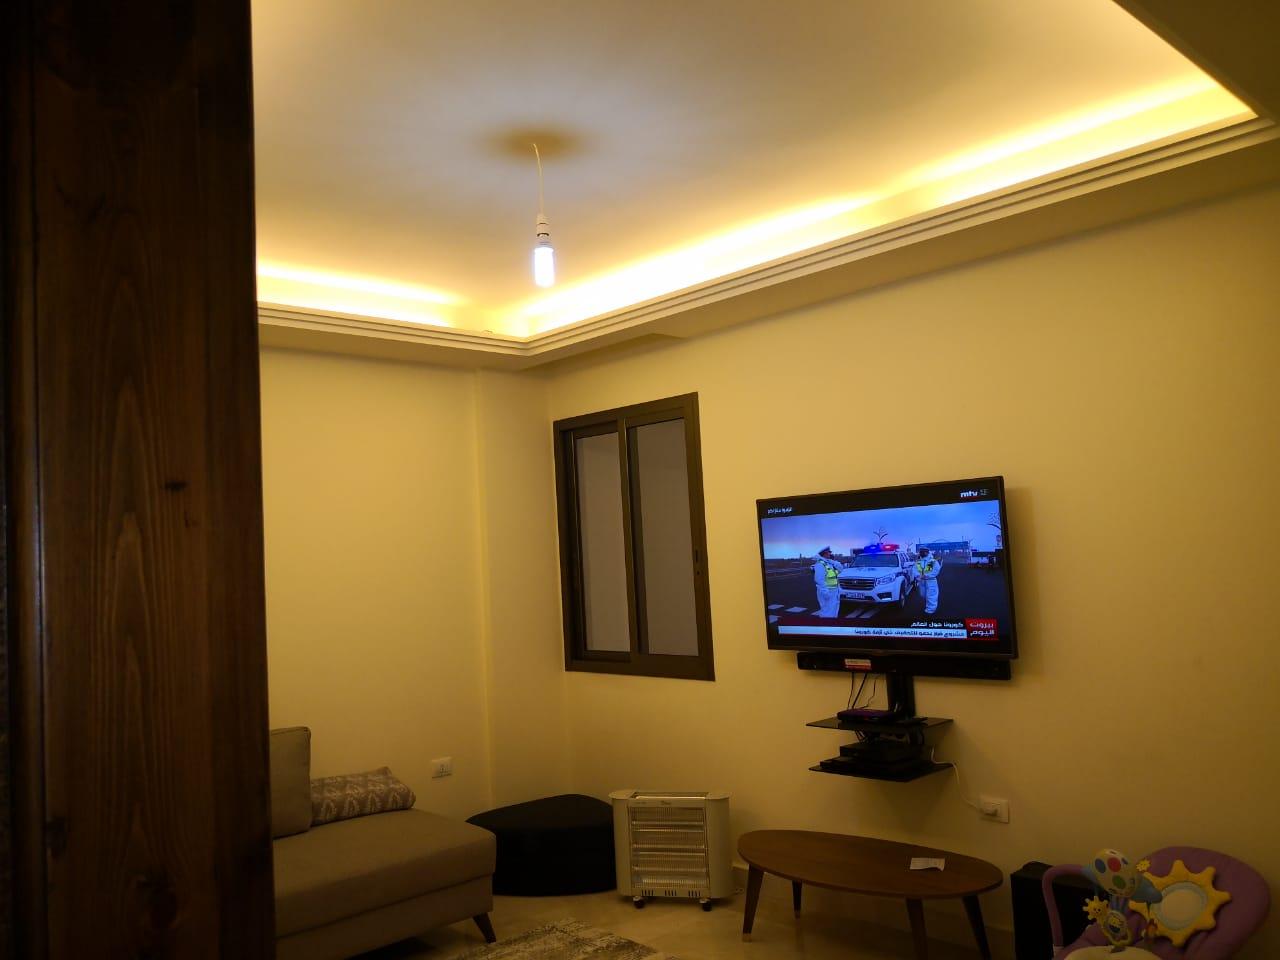 Apartment For Sale At Dam W Farez, Tripoli